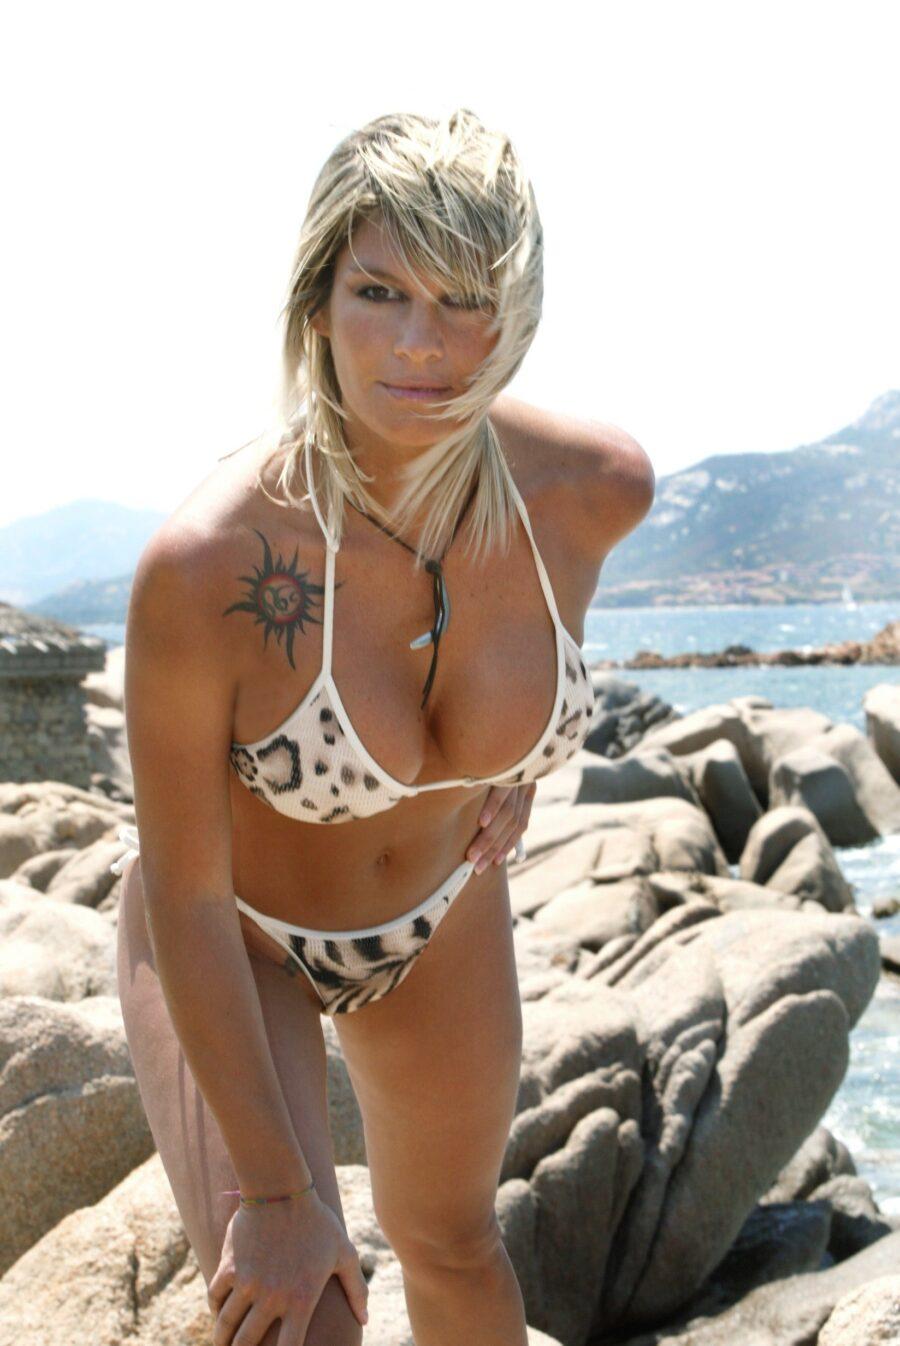 Mascia Ferri